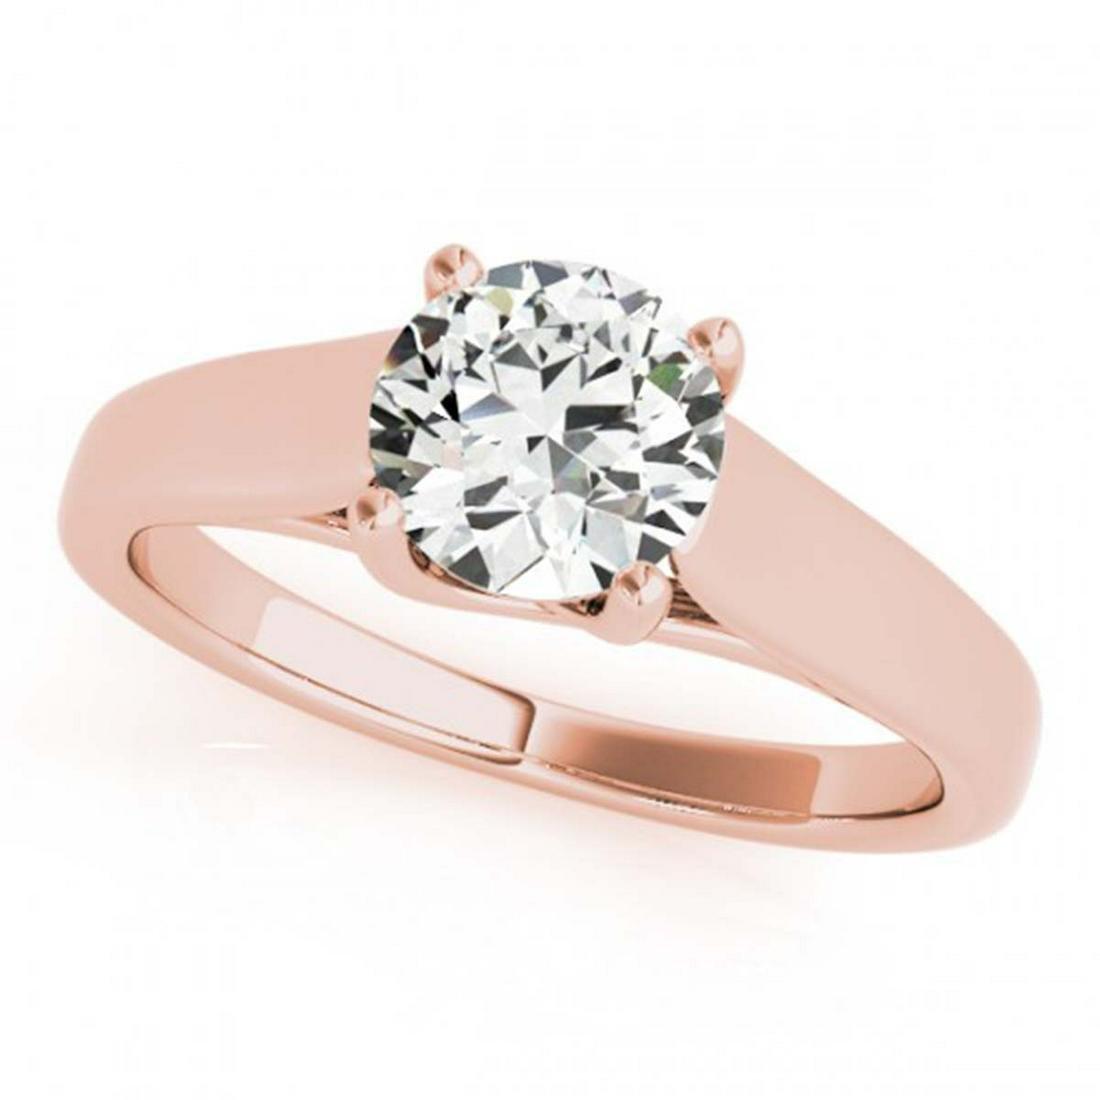 0.50 ctw VS/SI Diamond Ring 18K Rose Gold - REF-78K7W -